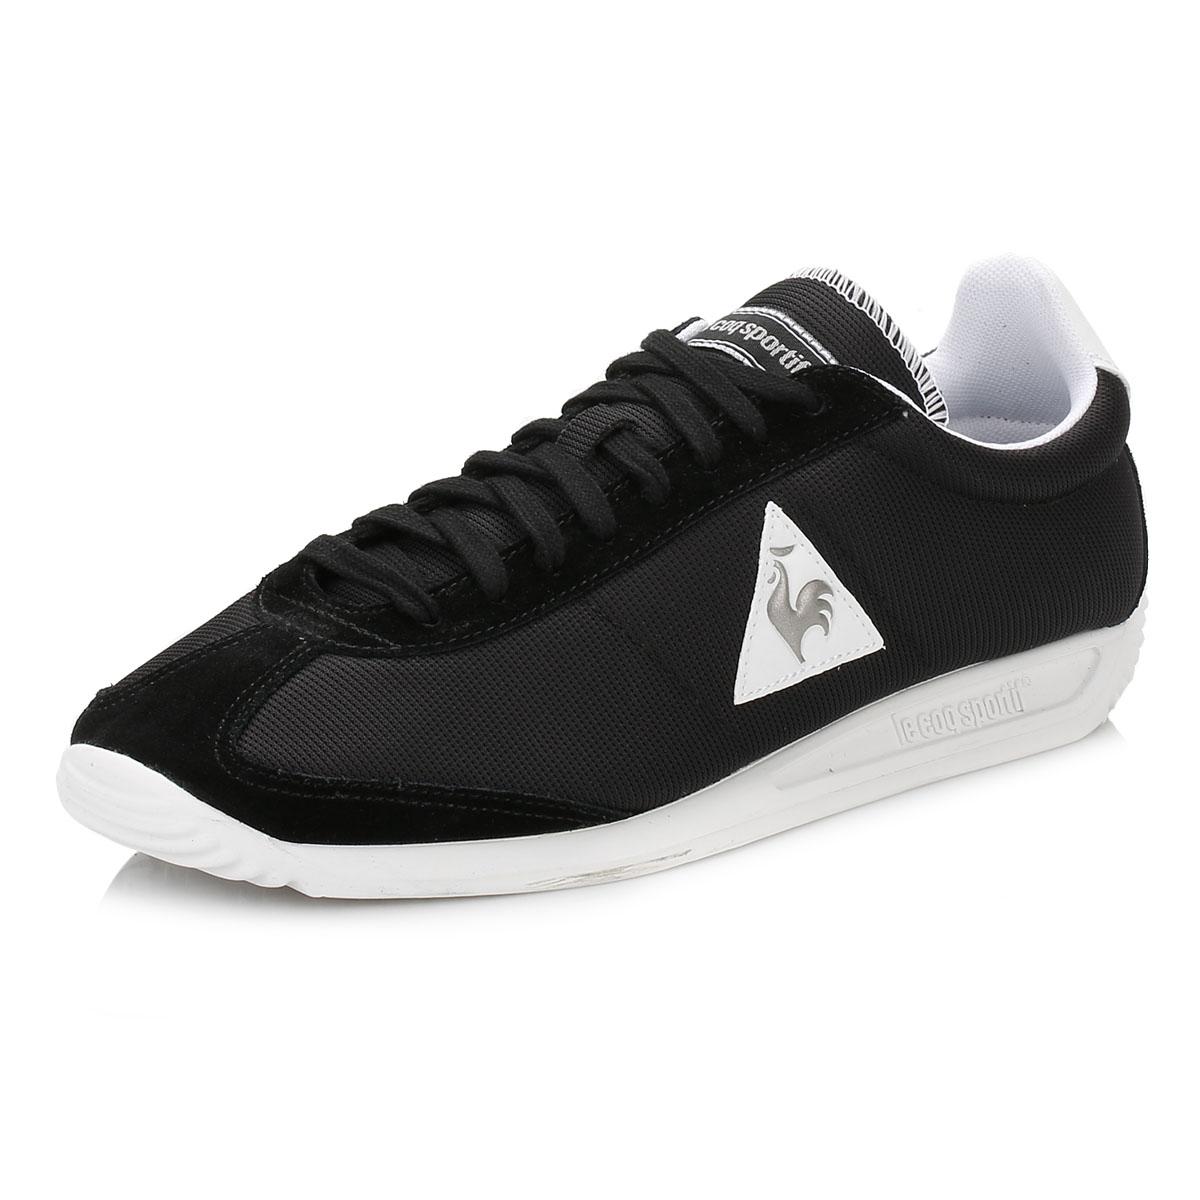 le coq sportif mens trainers quartz nylon lace up casual sport shoes ebay. Black Bedroom Furniture Sets. Home Design Ideas